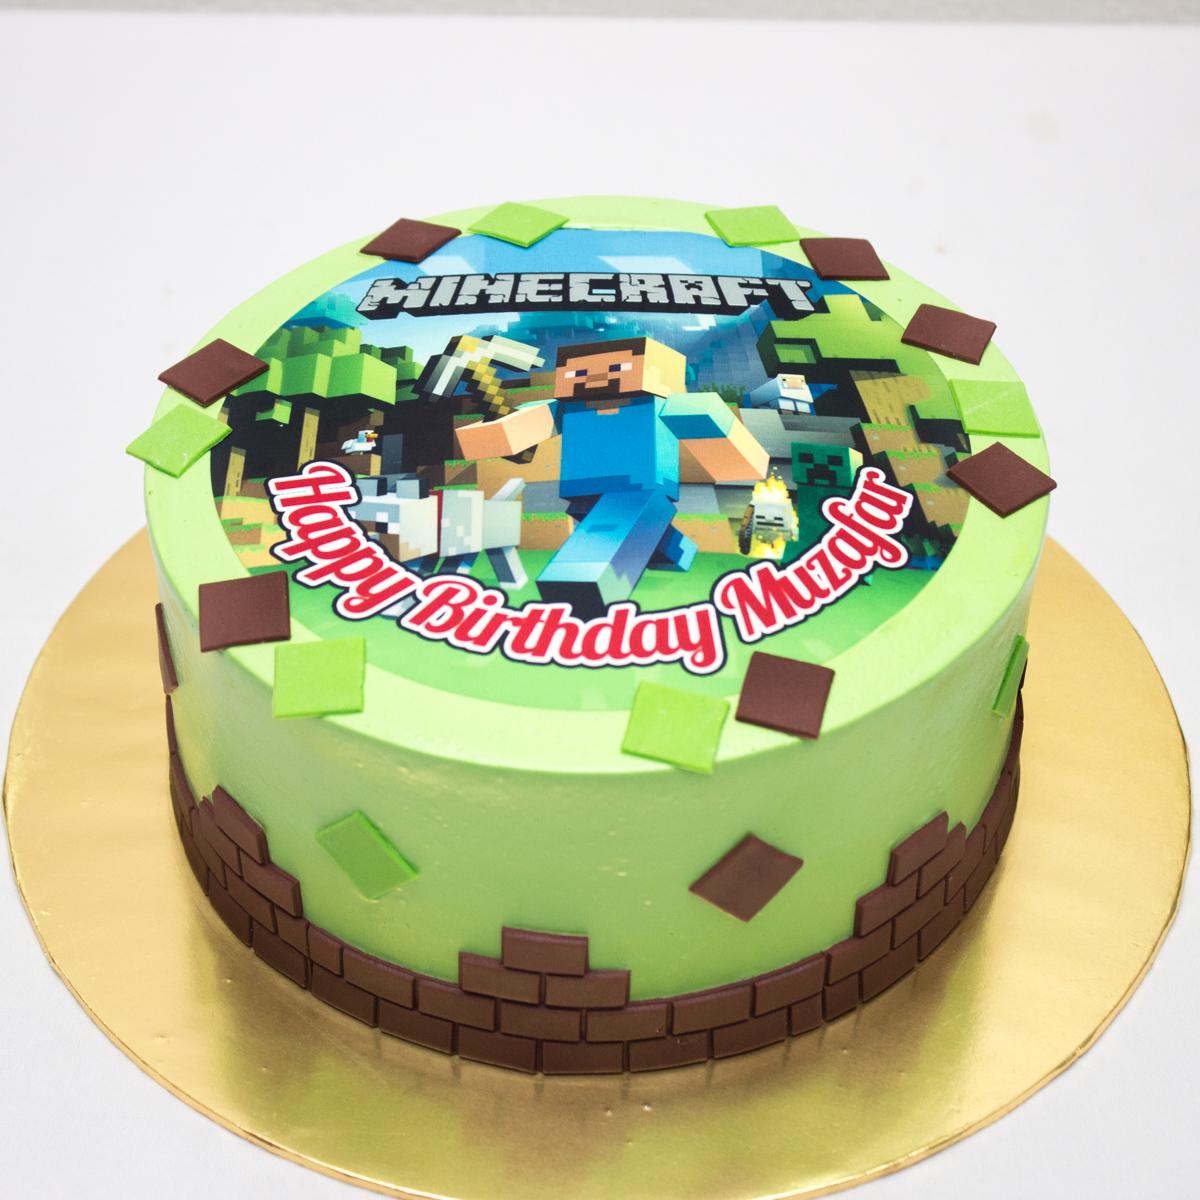 Edible Cake Images Minecraft : Lynn BabyCakes: August 2016